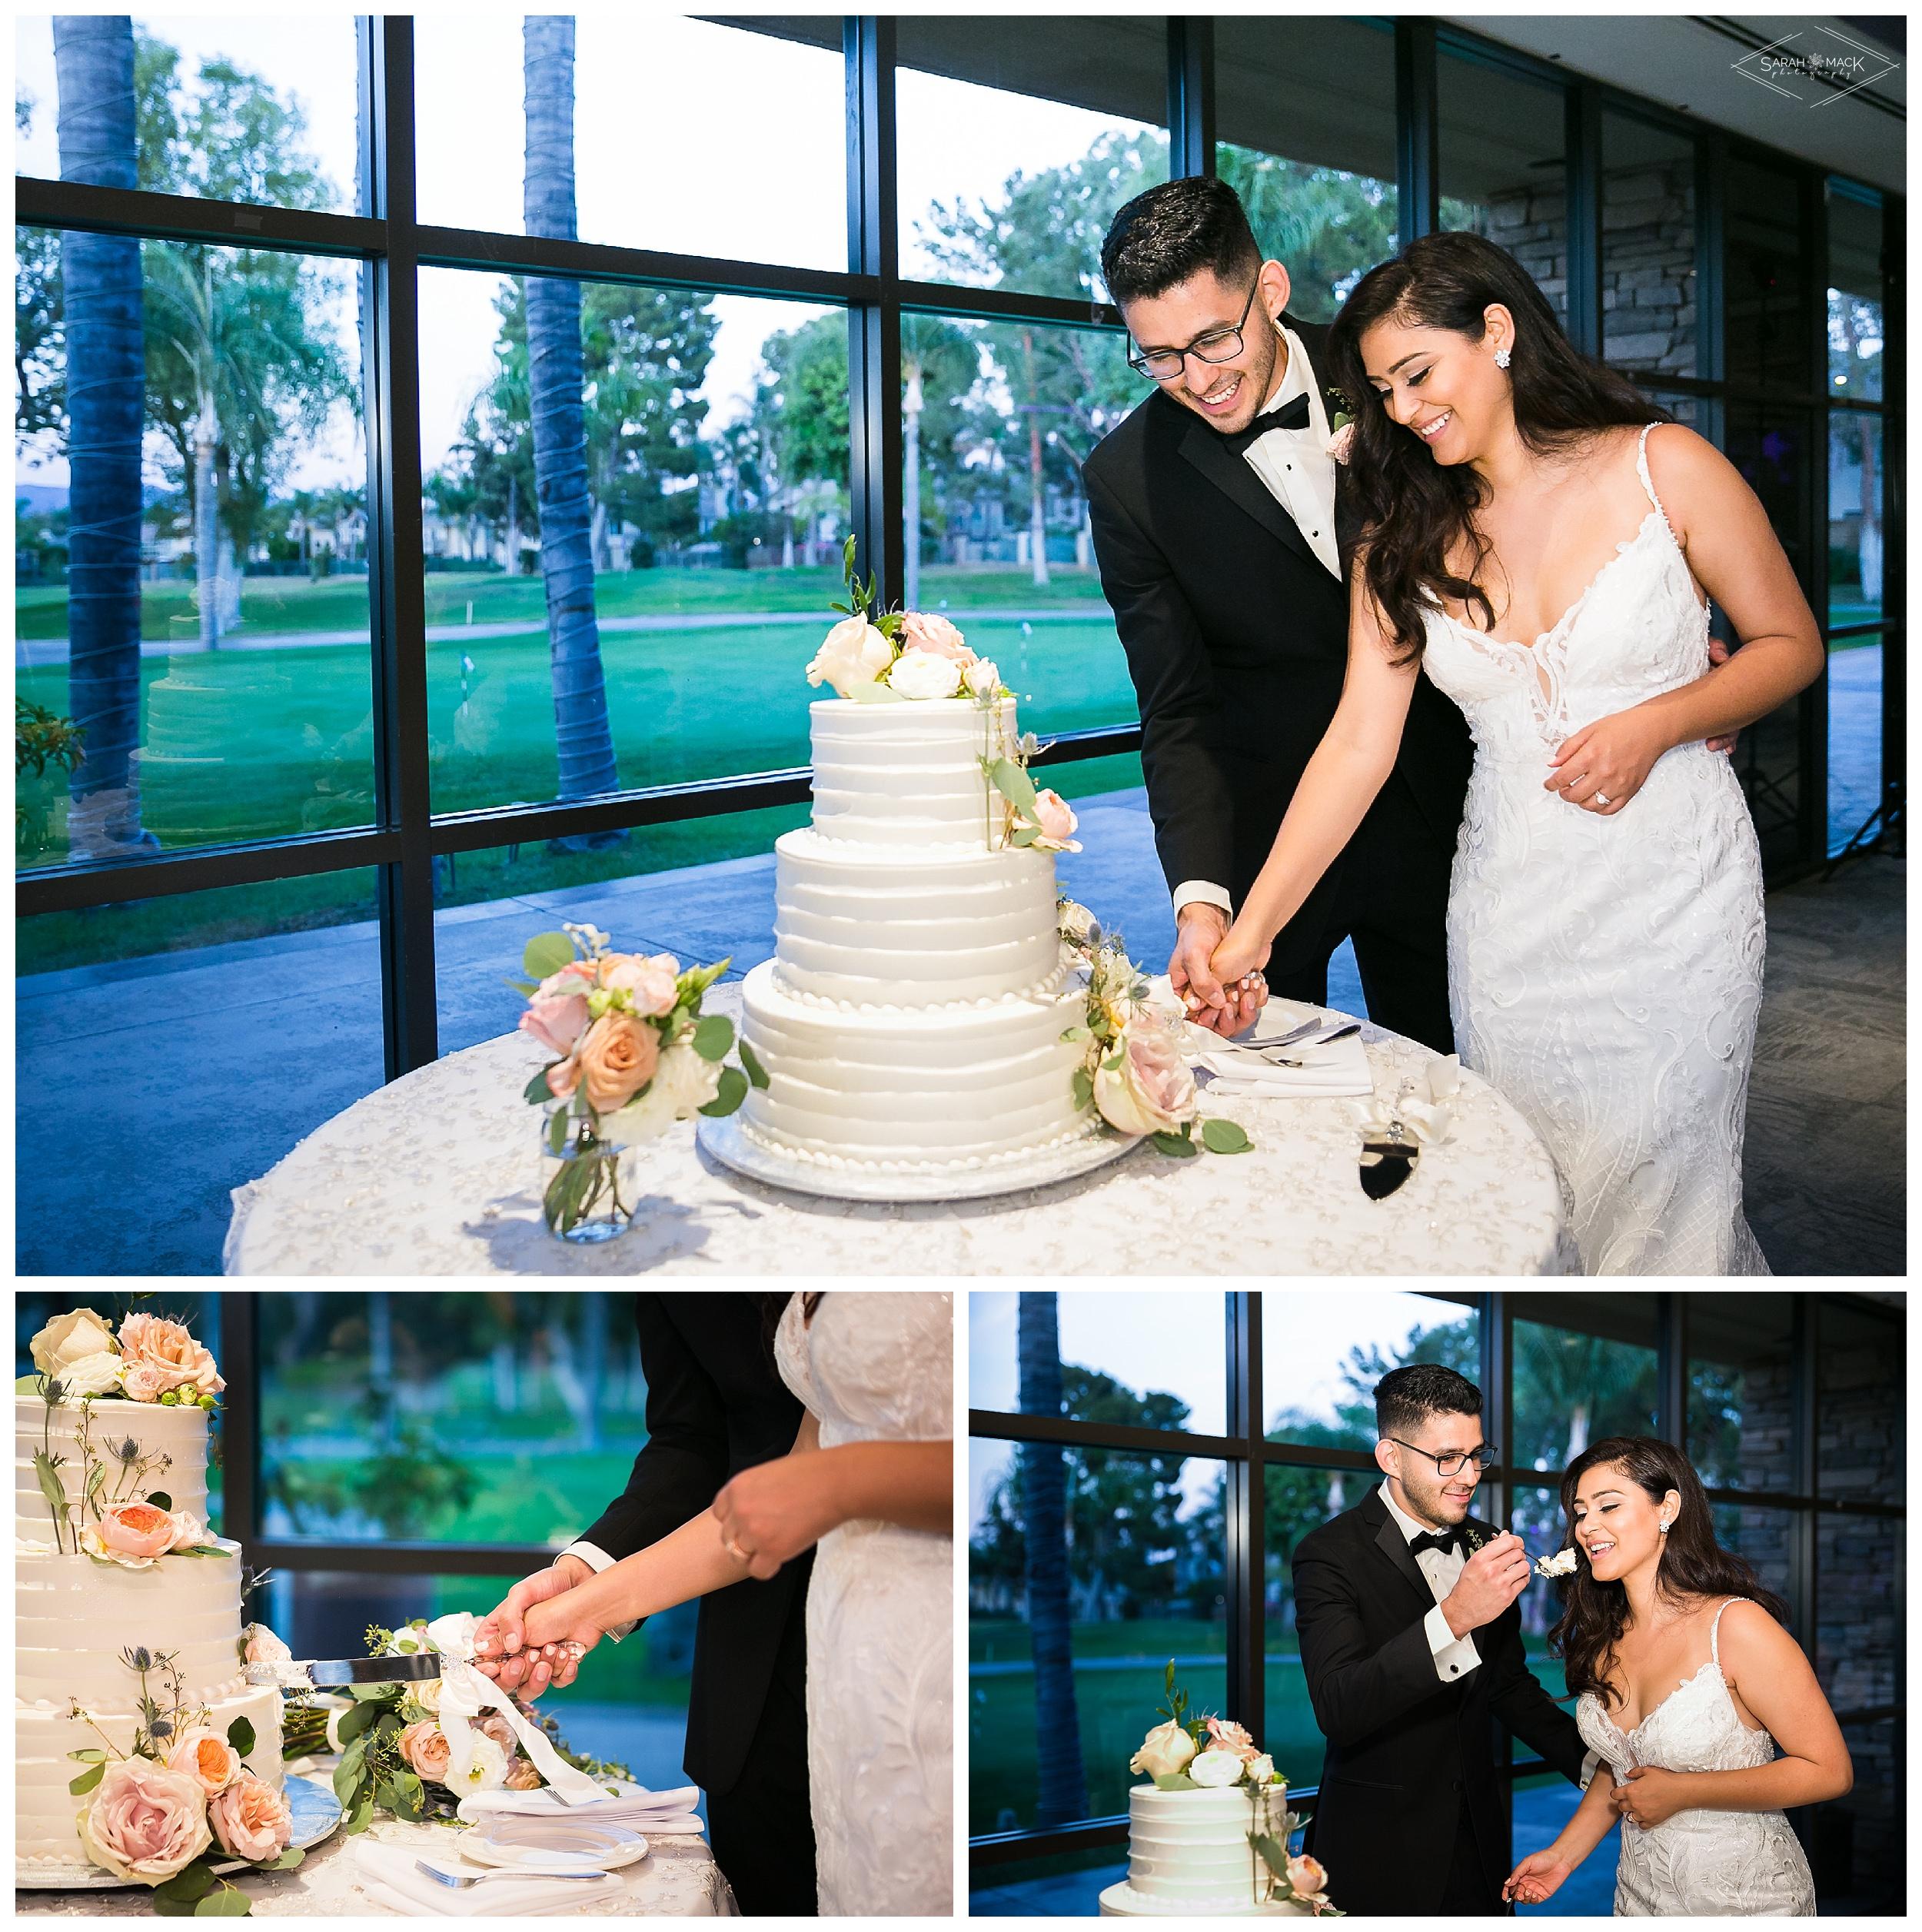 IA-Alta-Vista-Country-Club-Yorba-Linda-Wedding-Photography 560.jpg